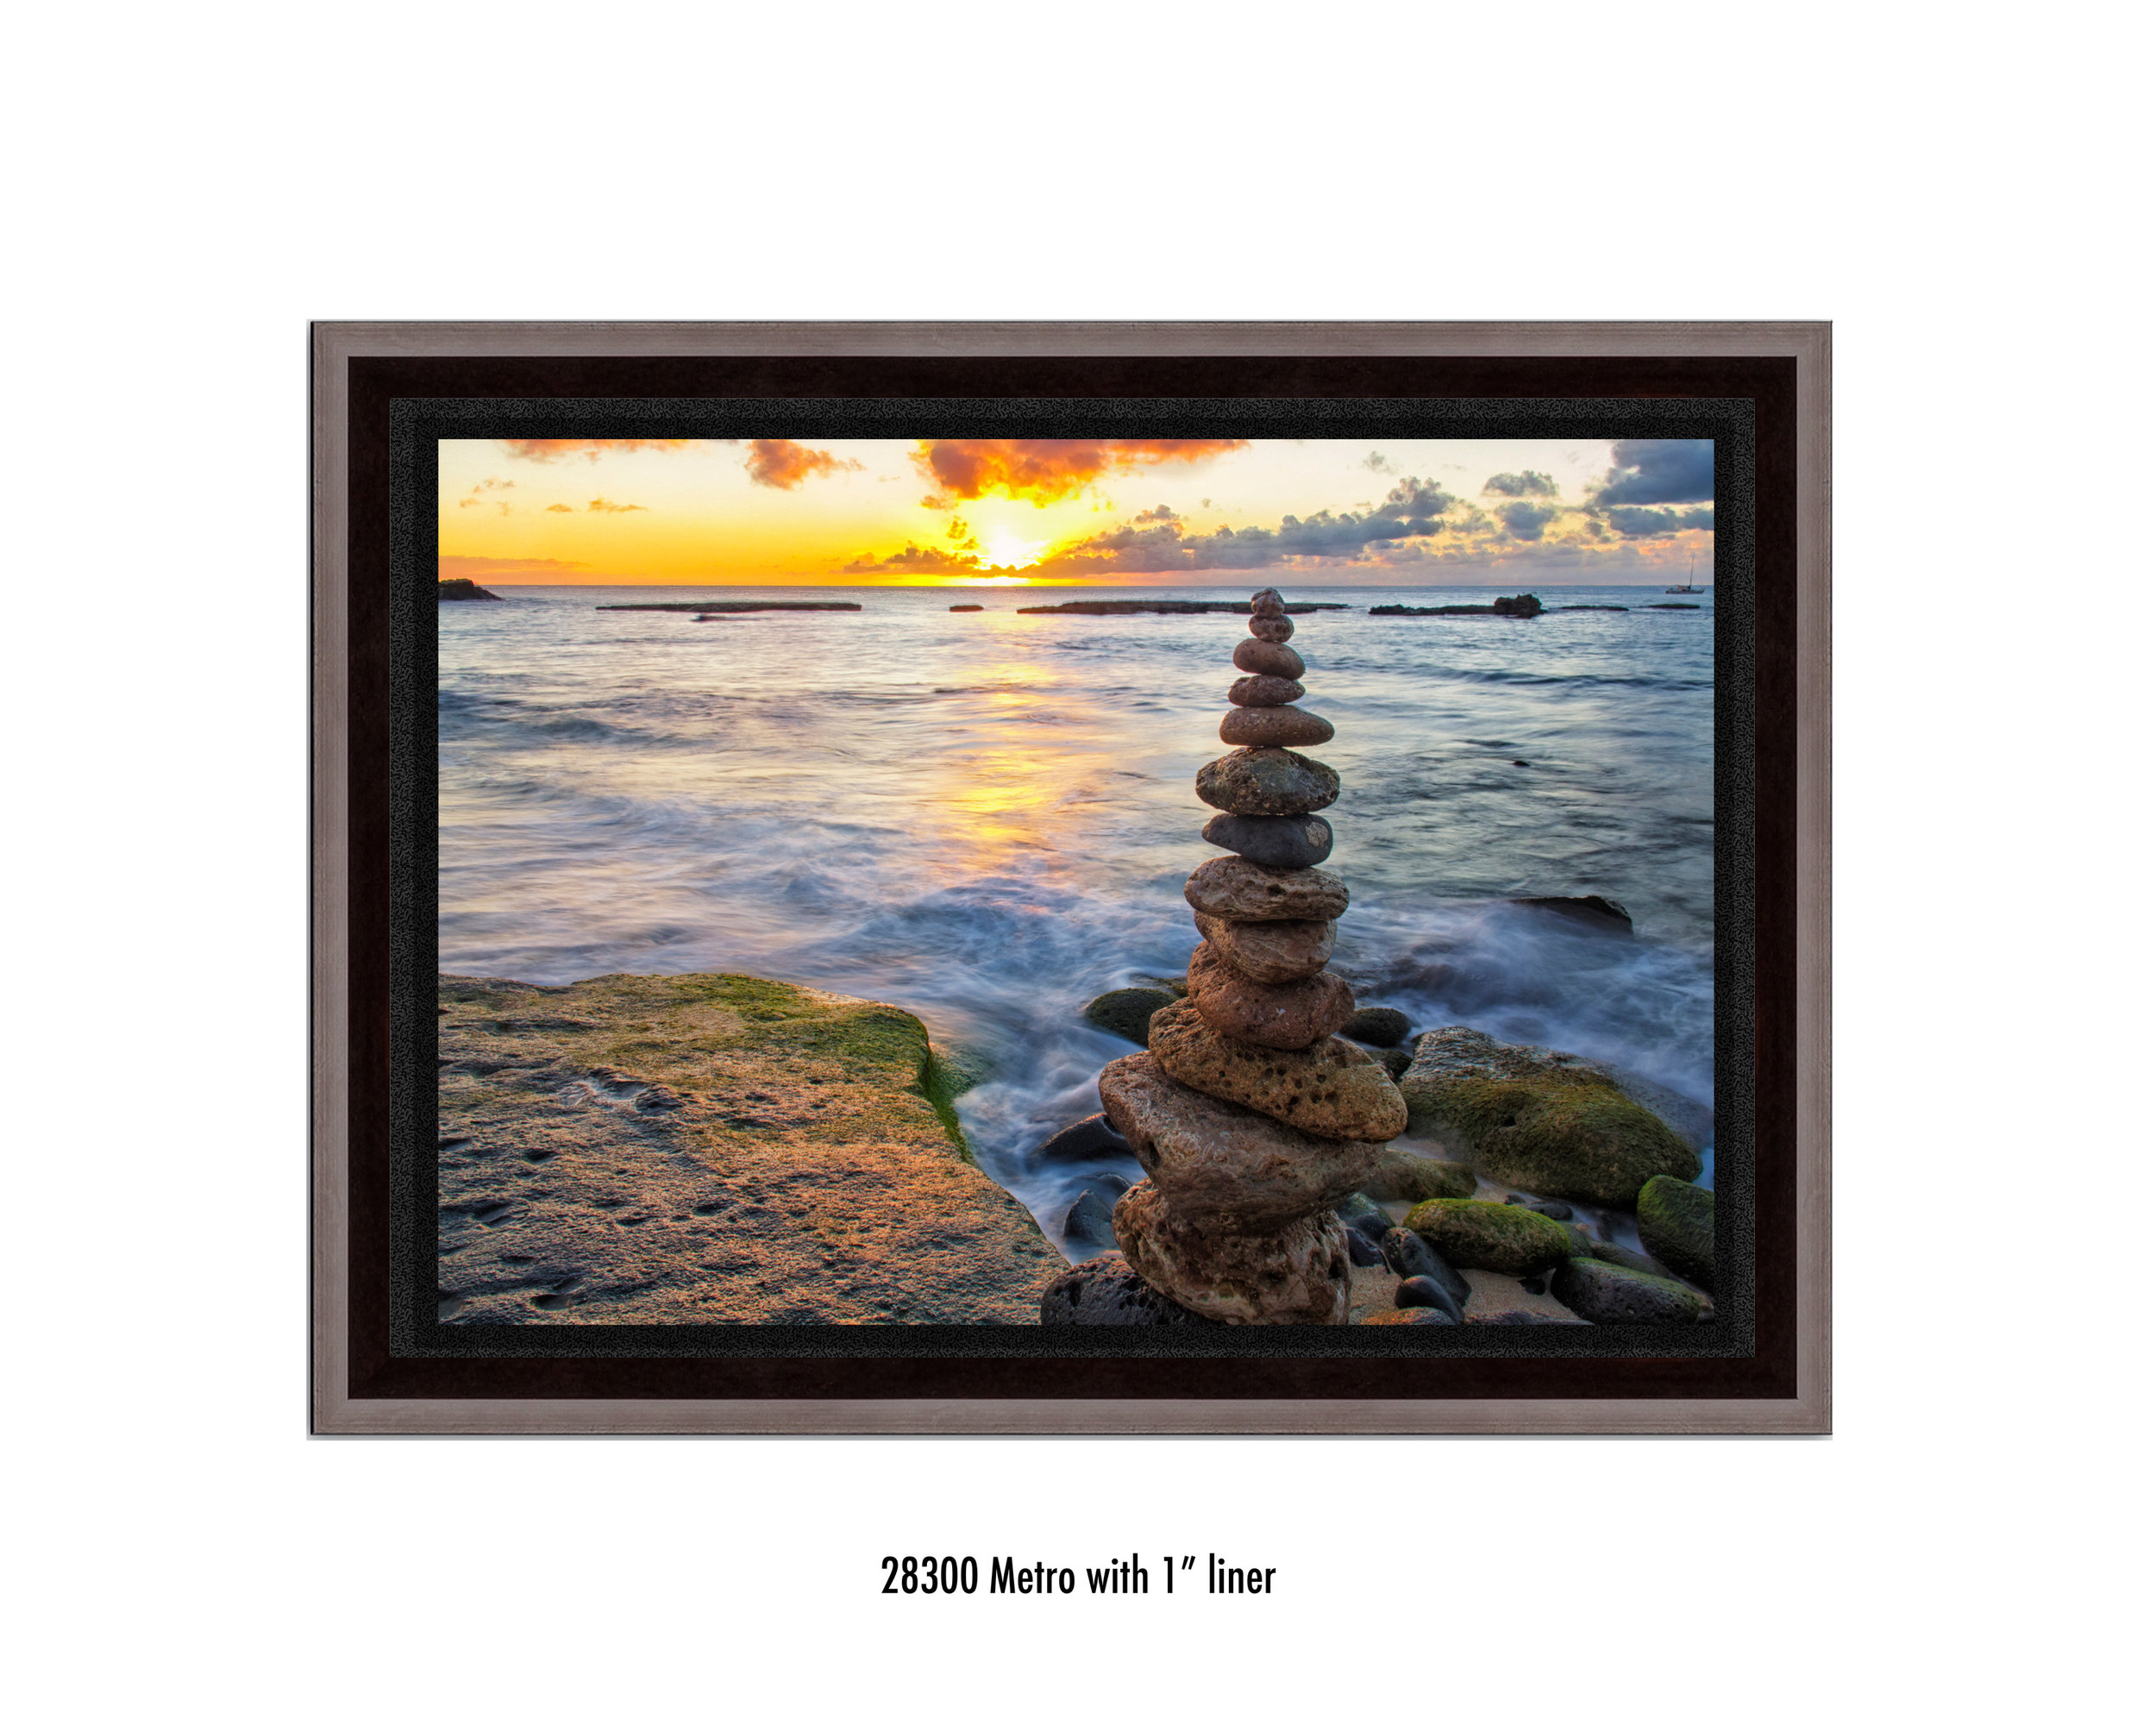 Ahu-Sunset-28300-1-blk.jpg